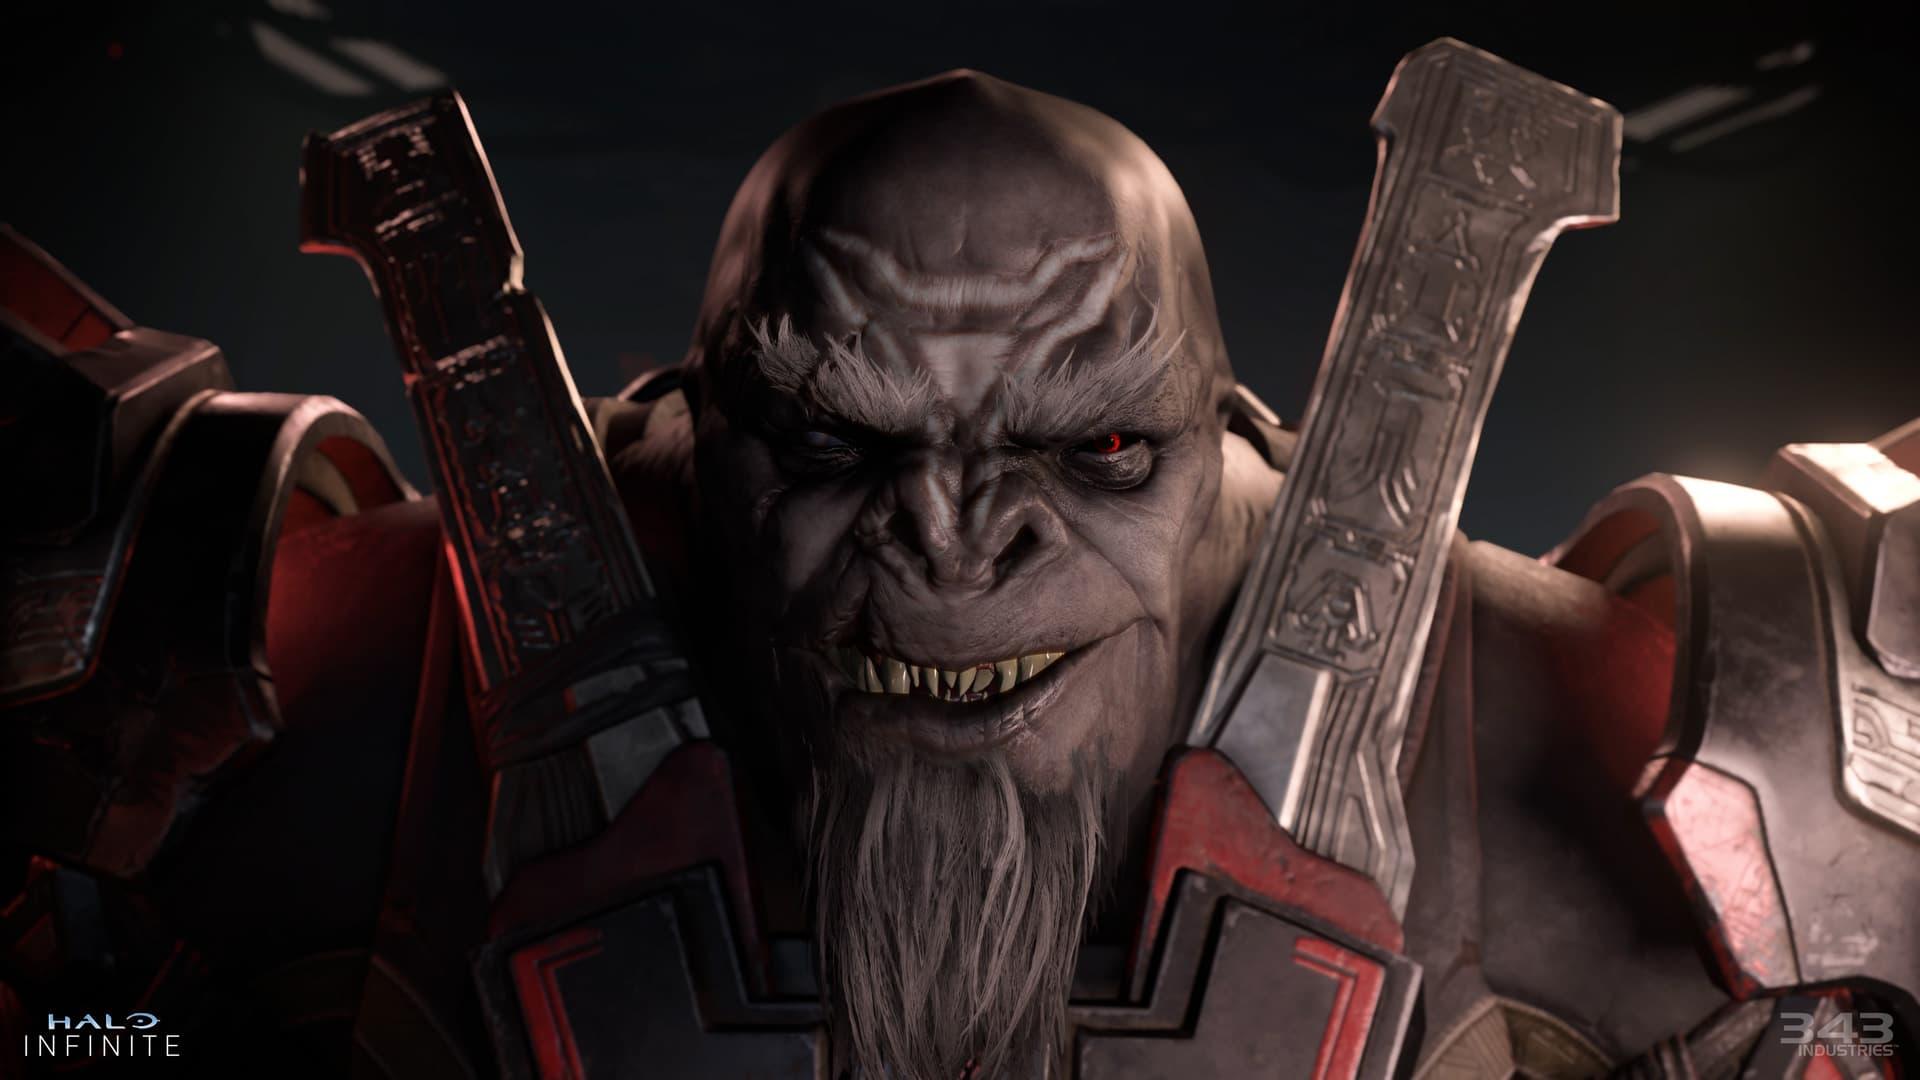 Phil Spencer asegura que la idea de sacar Halo Infinite en partes se abandonó 3